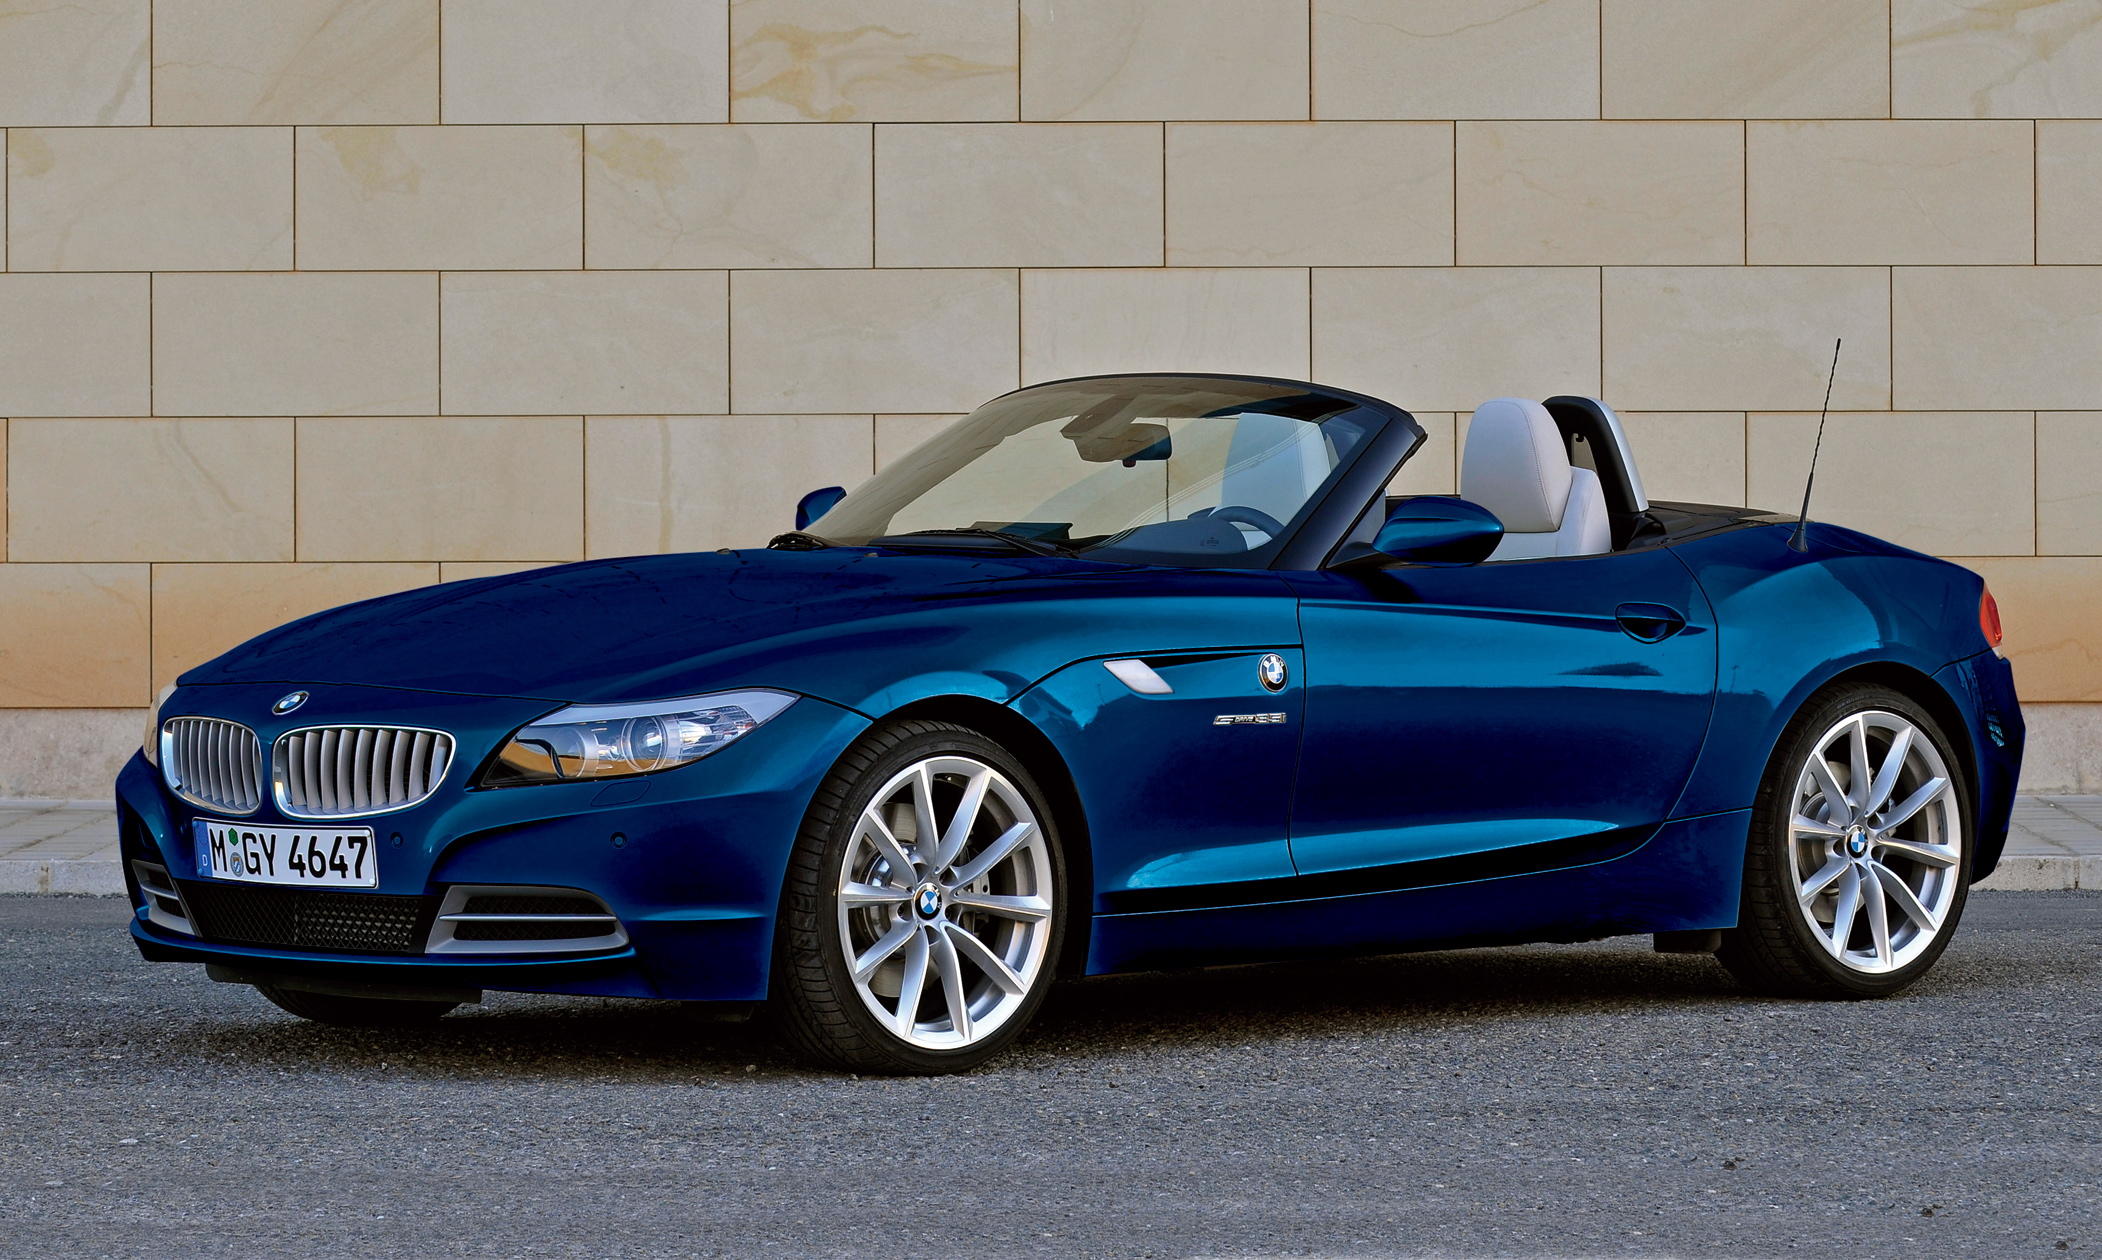 BMW решил прекратить выпуск родстера Z4